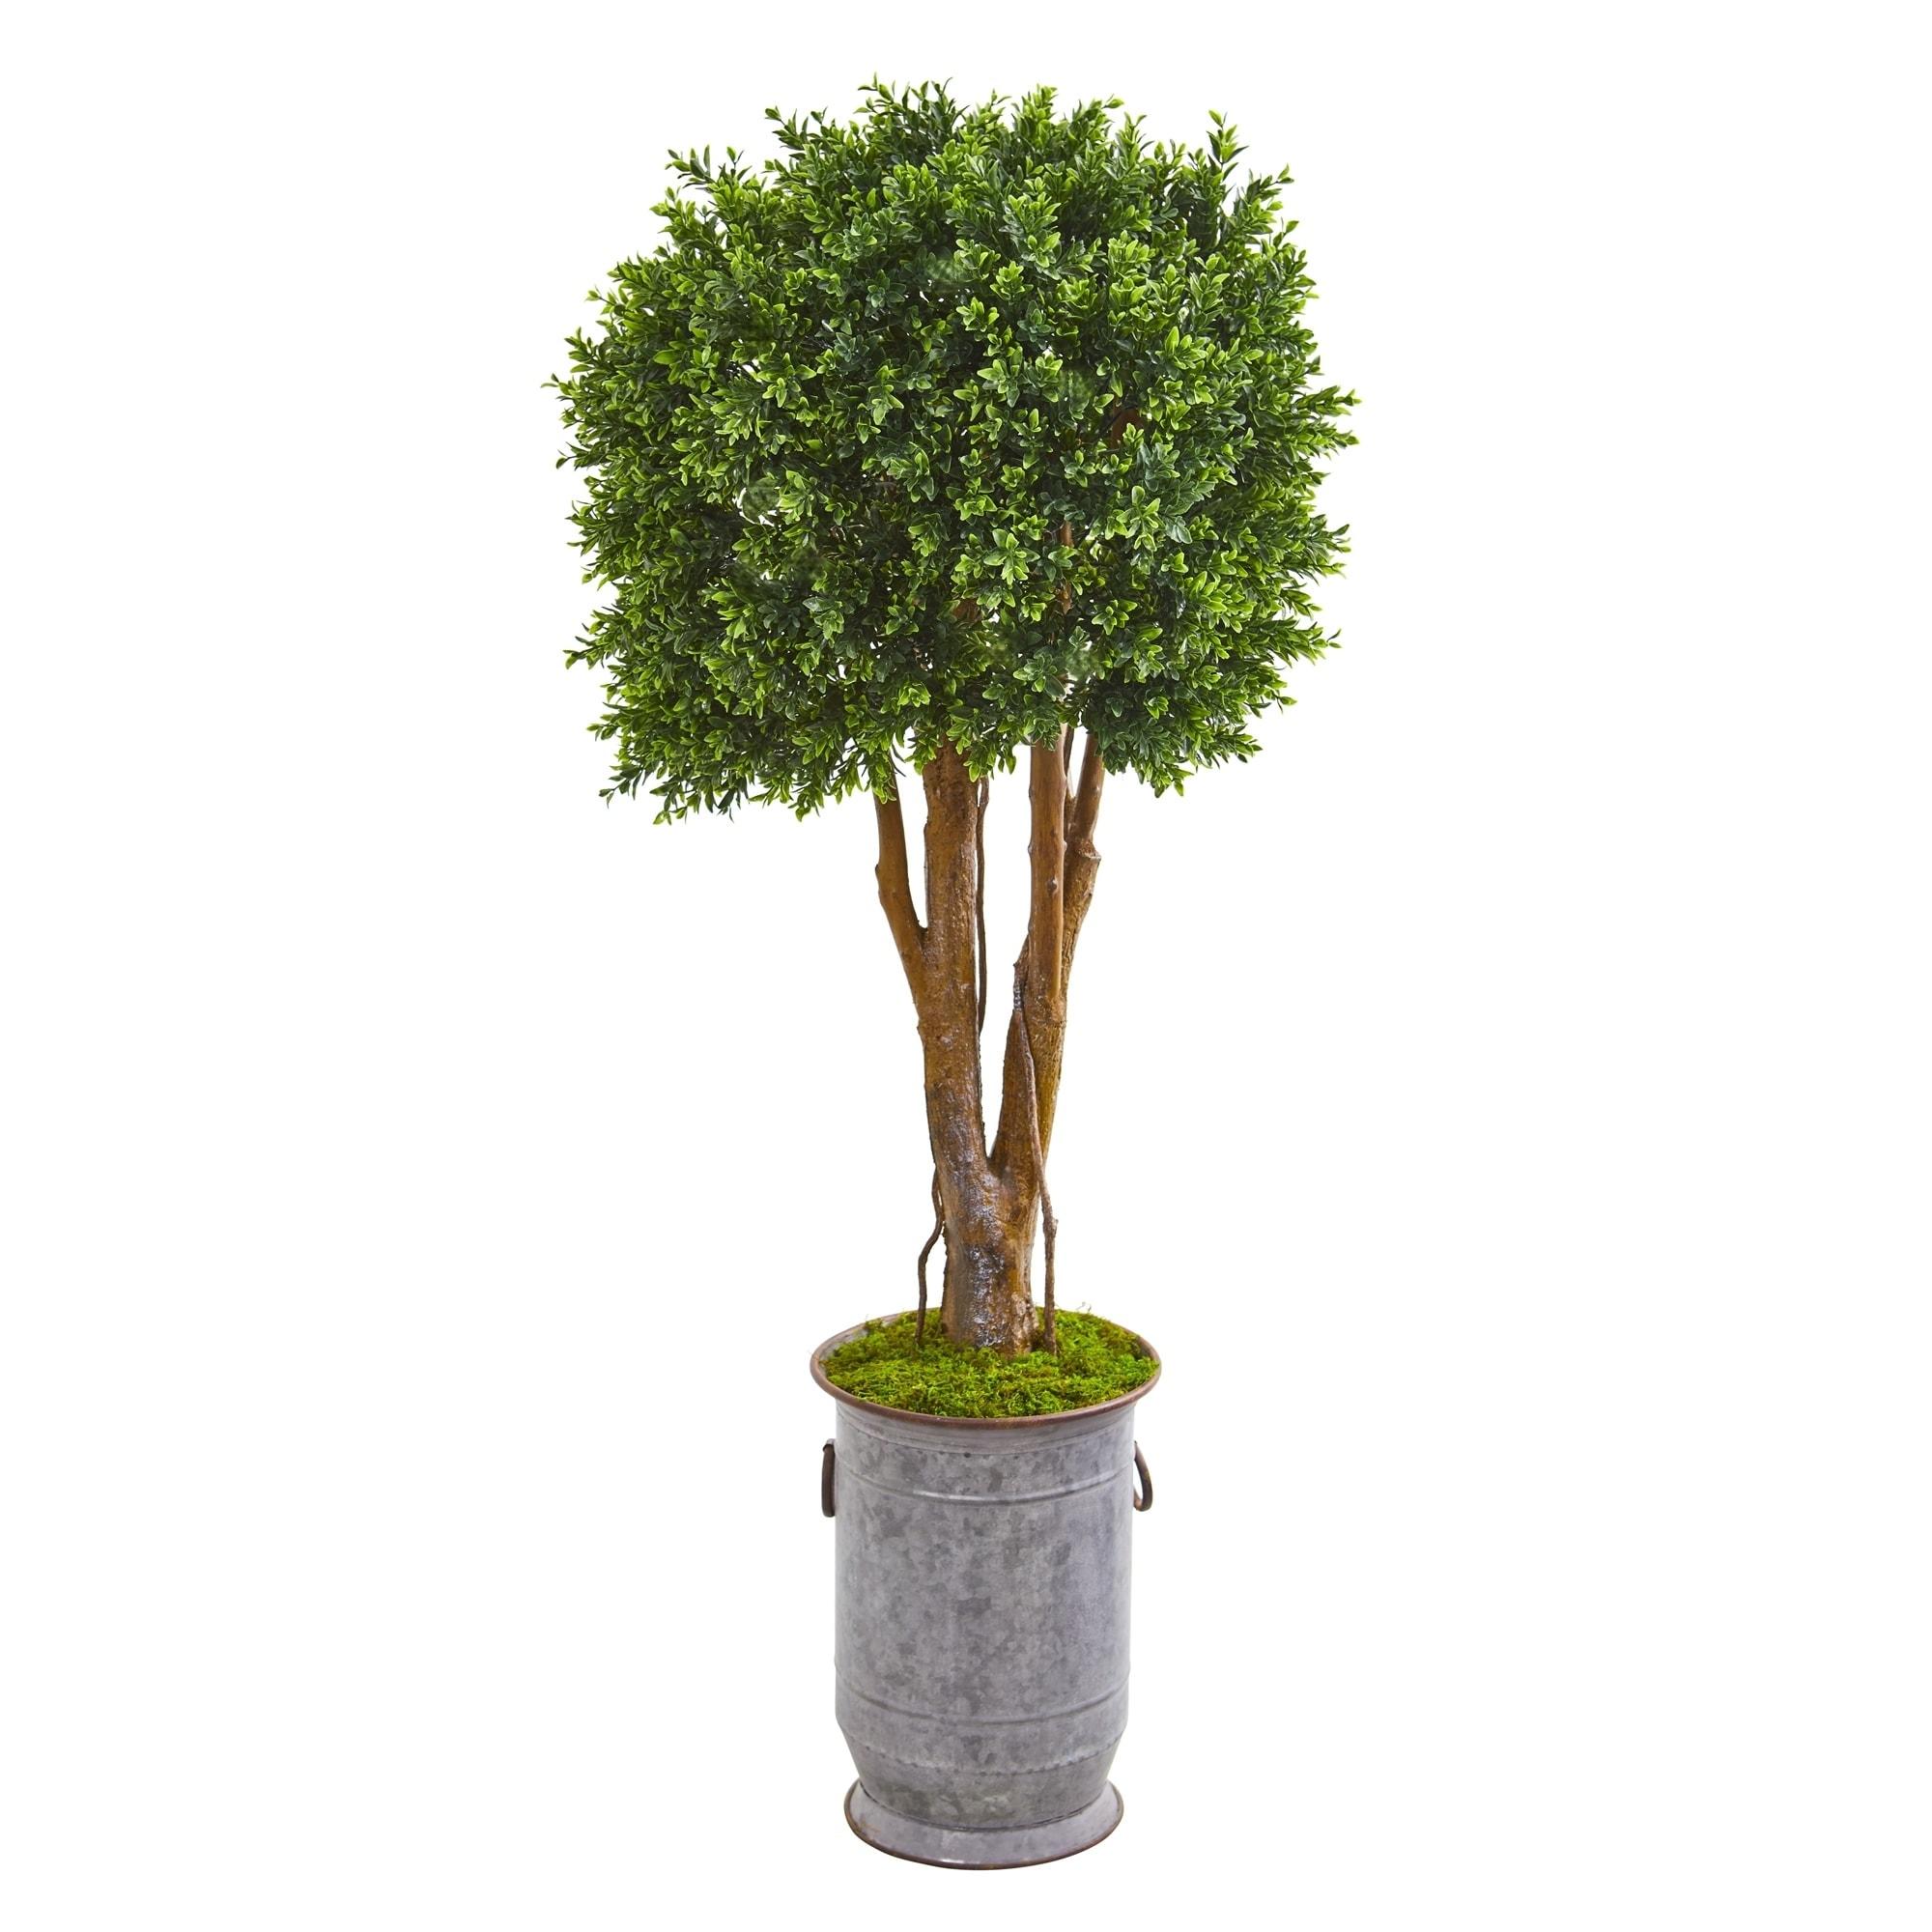 55 Boxwood Artificial Topiary Tree in Planter UV Resistant (Indoor/Outdoor)